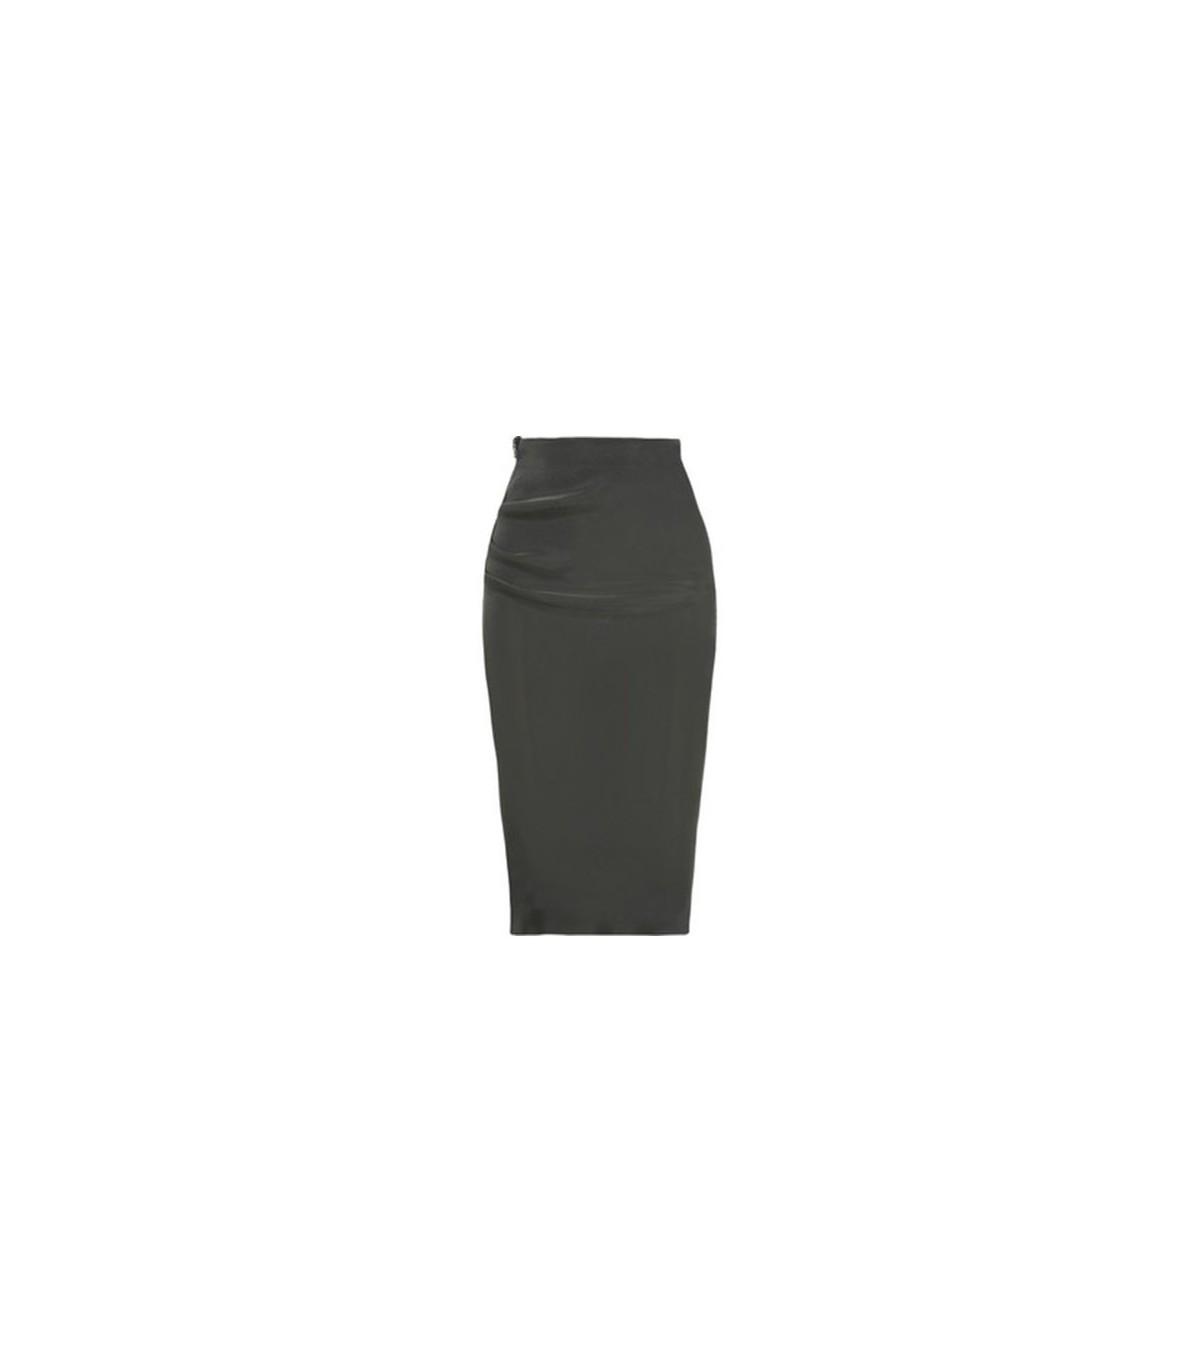 c2b1530676 Stretch Satin Pencil Skirt Size S. Black Stretch Satin Pinstripe Skirt. Pencil  Skirt. Black Pencil Antonio Melani Adelaide Stretch Satin Exaggerated Bow  ...